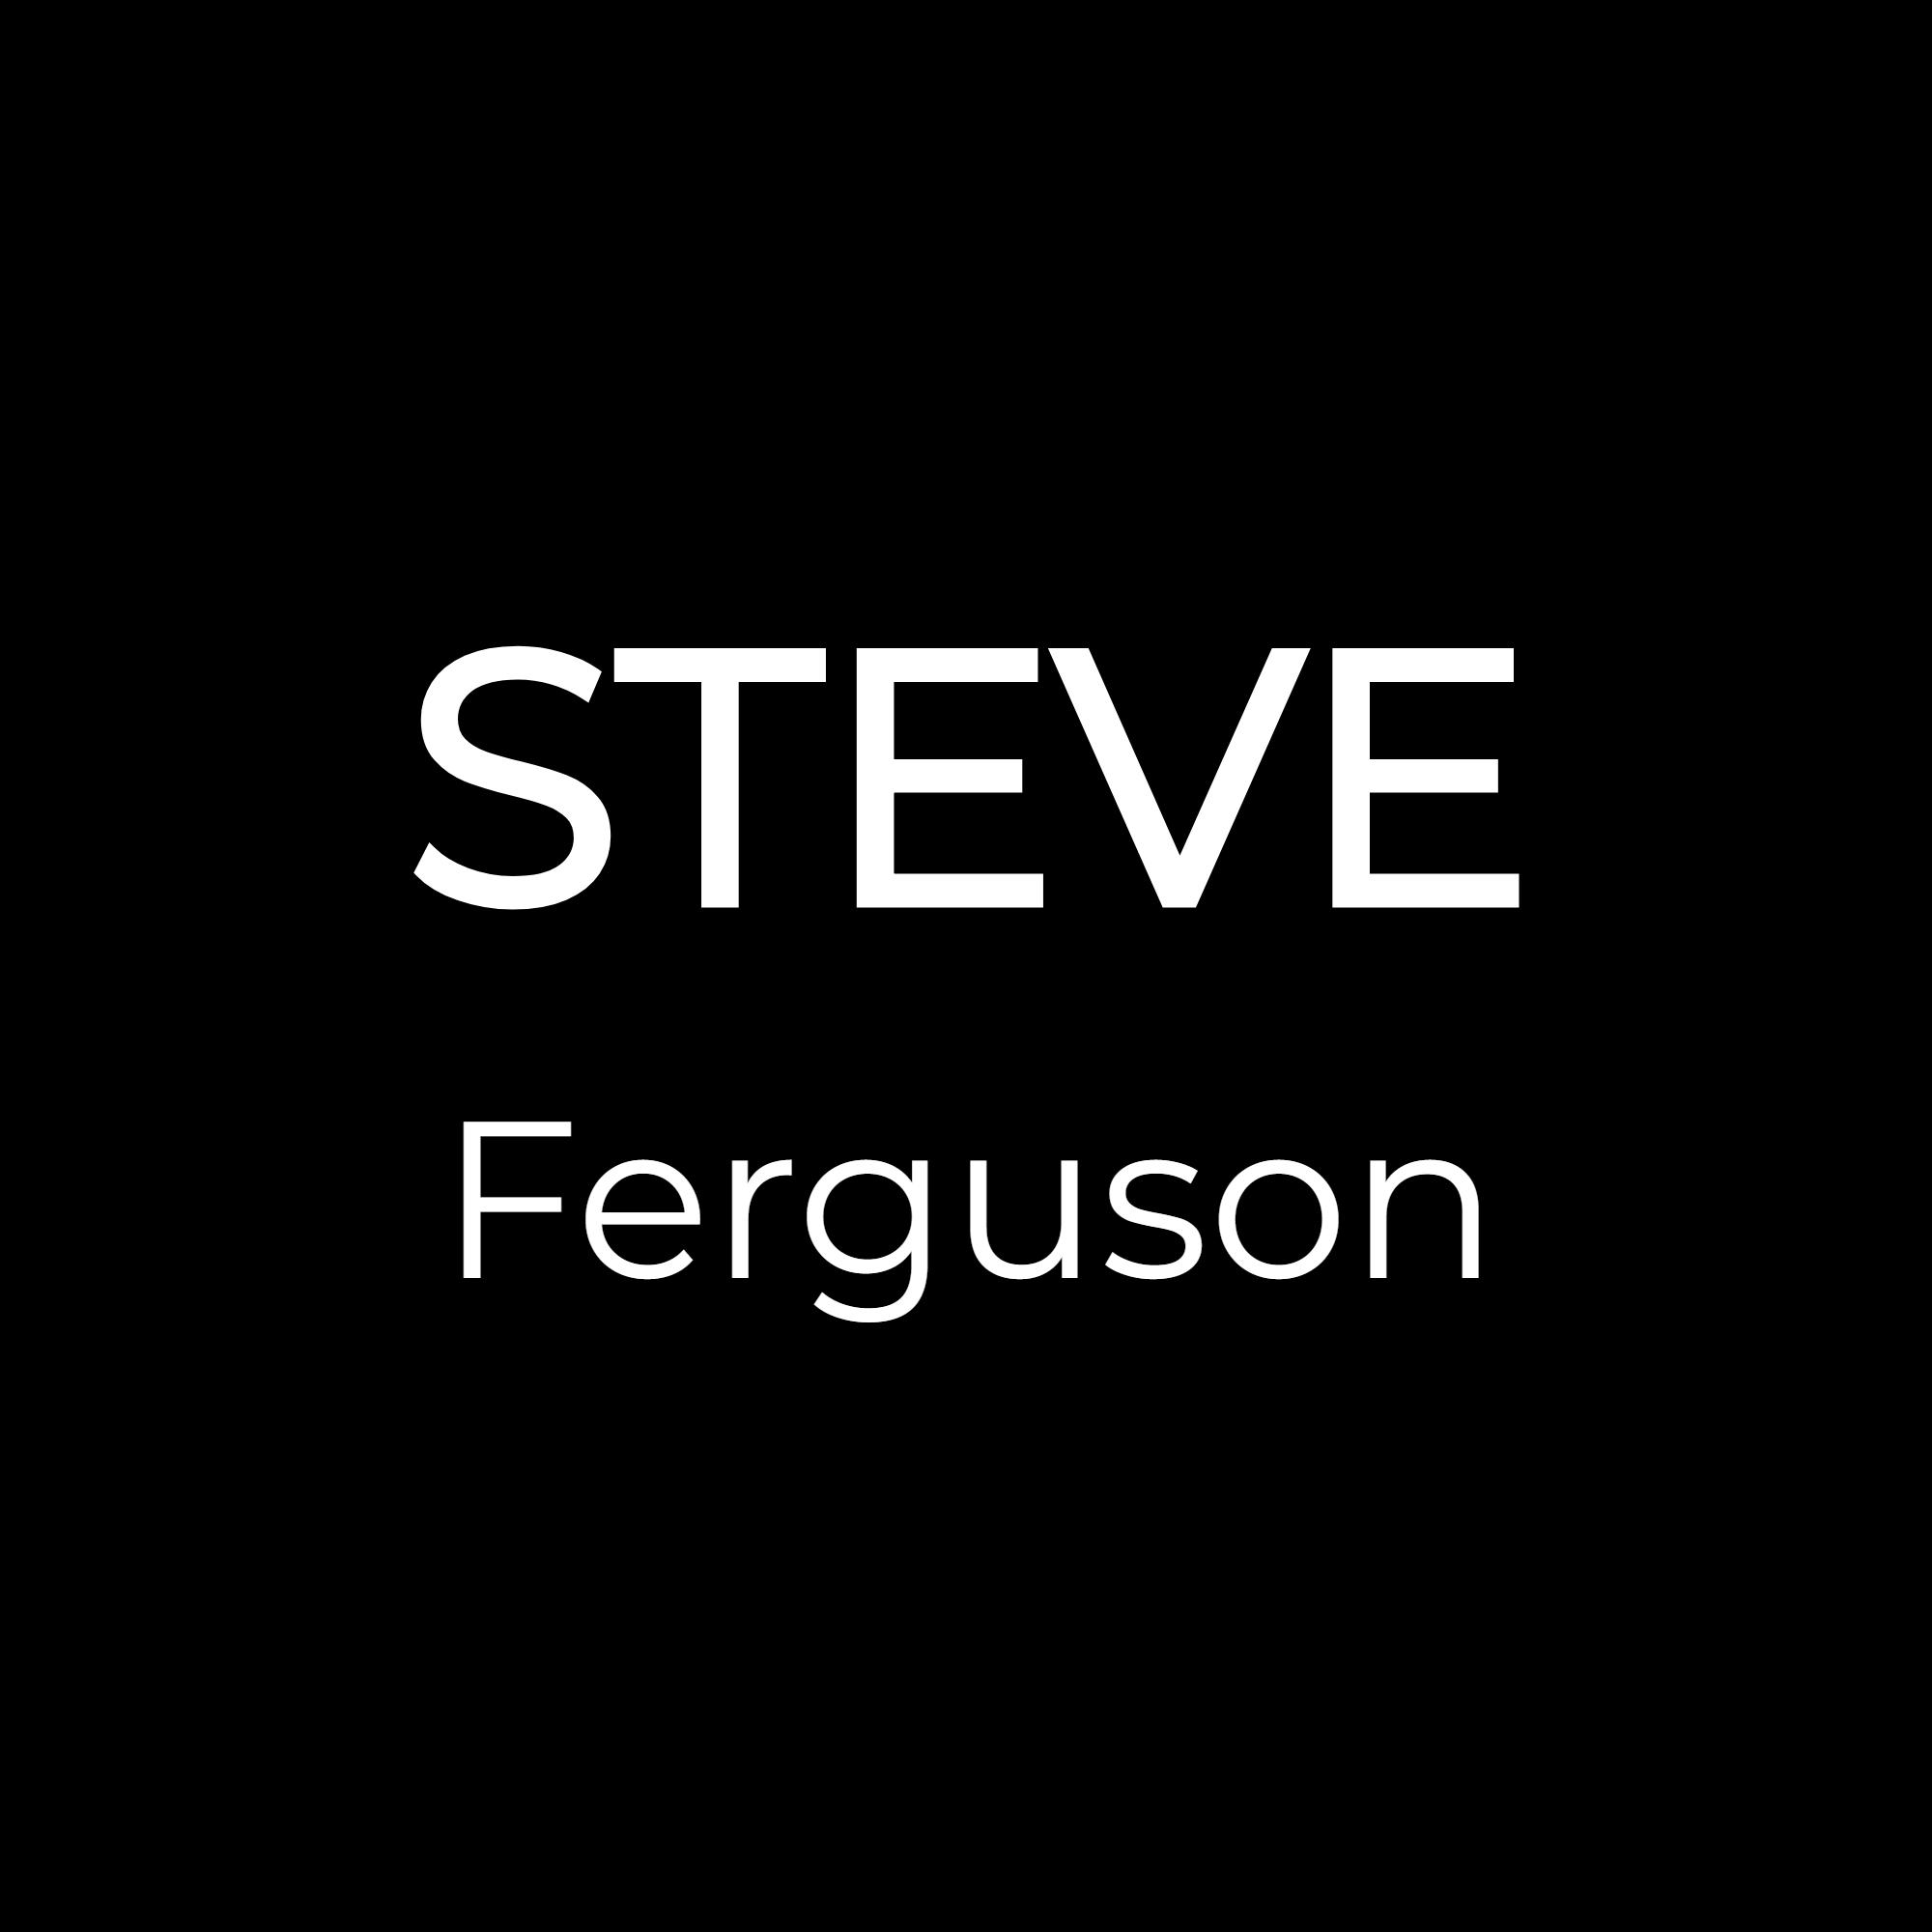 STEVE-logo-black.png